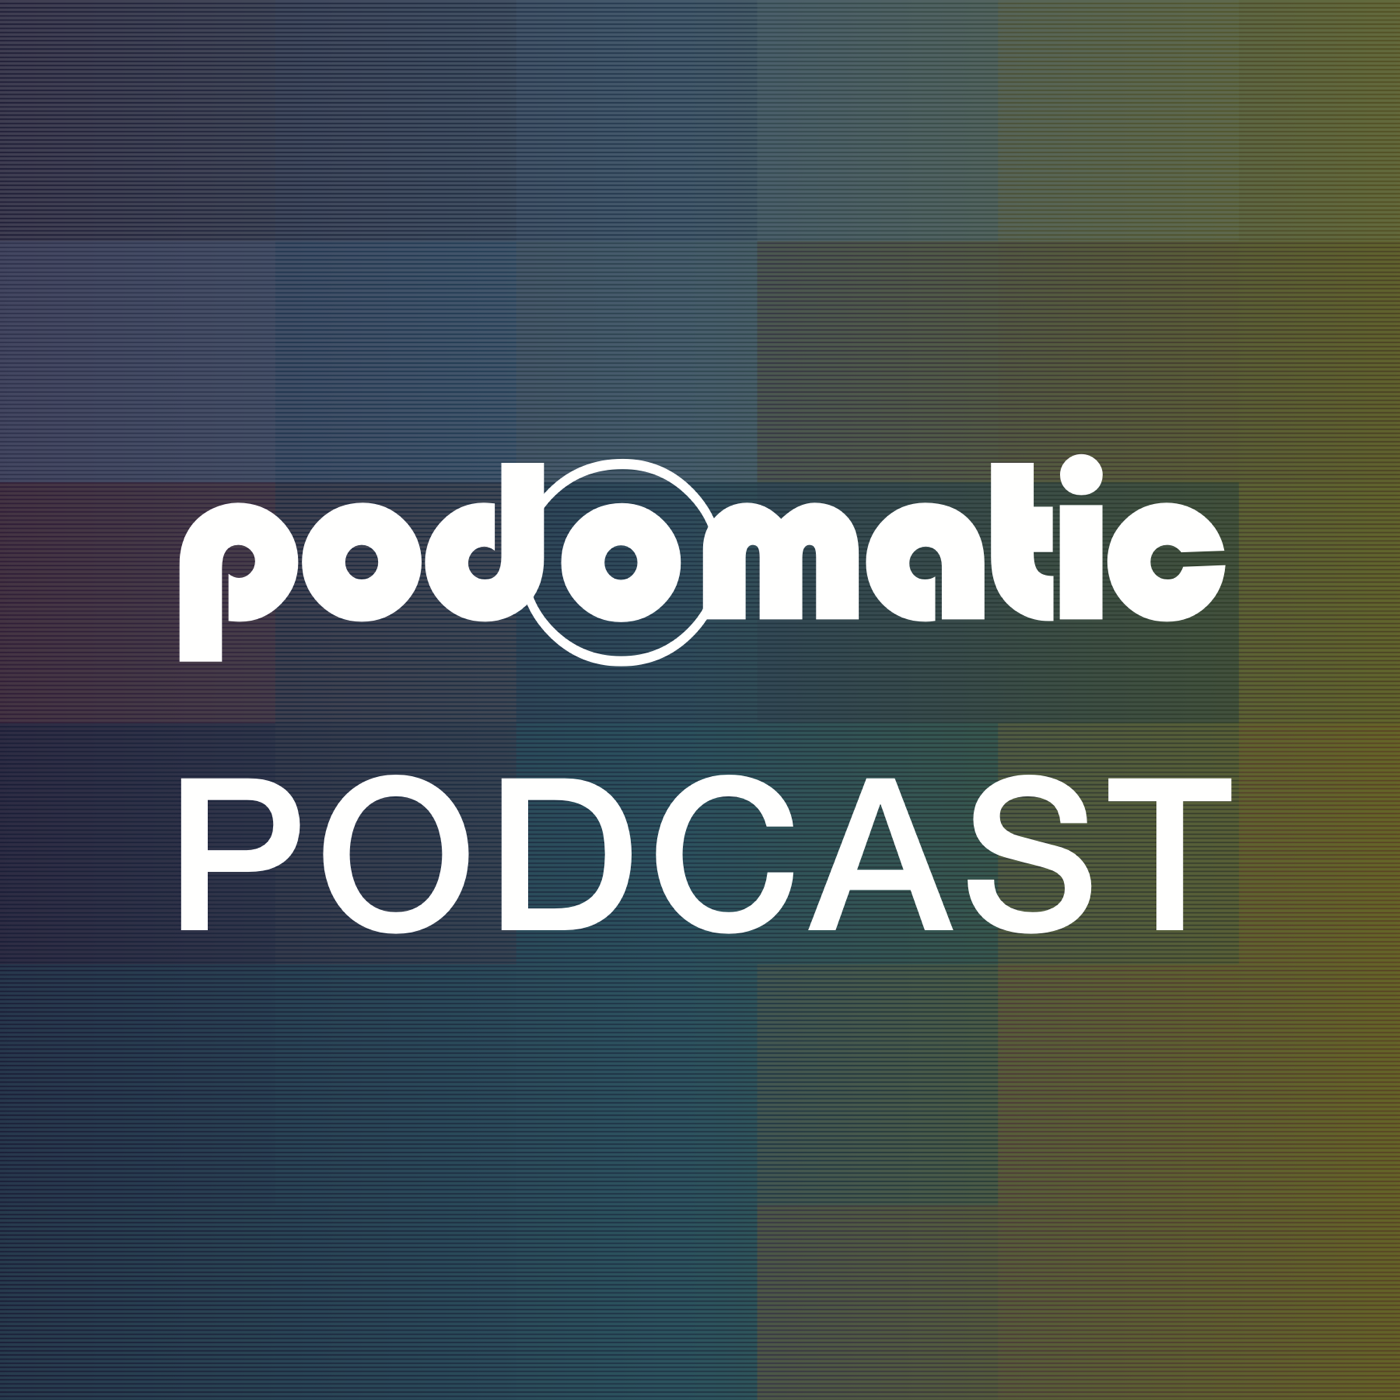 BetheChristianFellwoship's Podcast